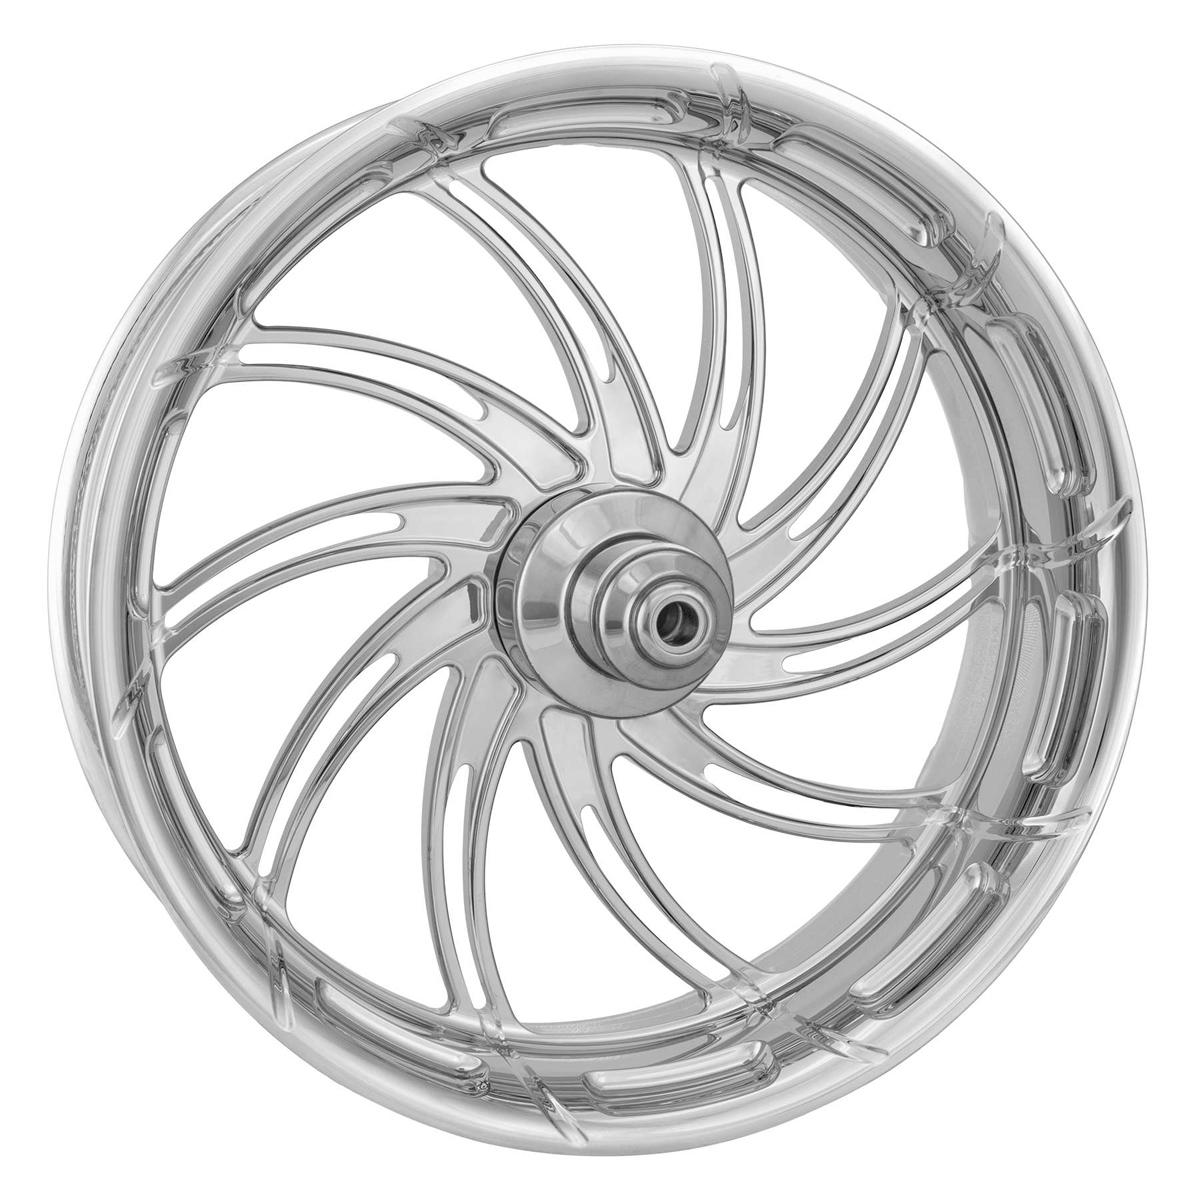 Performance Machine Supra Chrome Rear Wheel 18 x 5.5